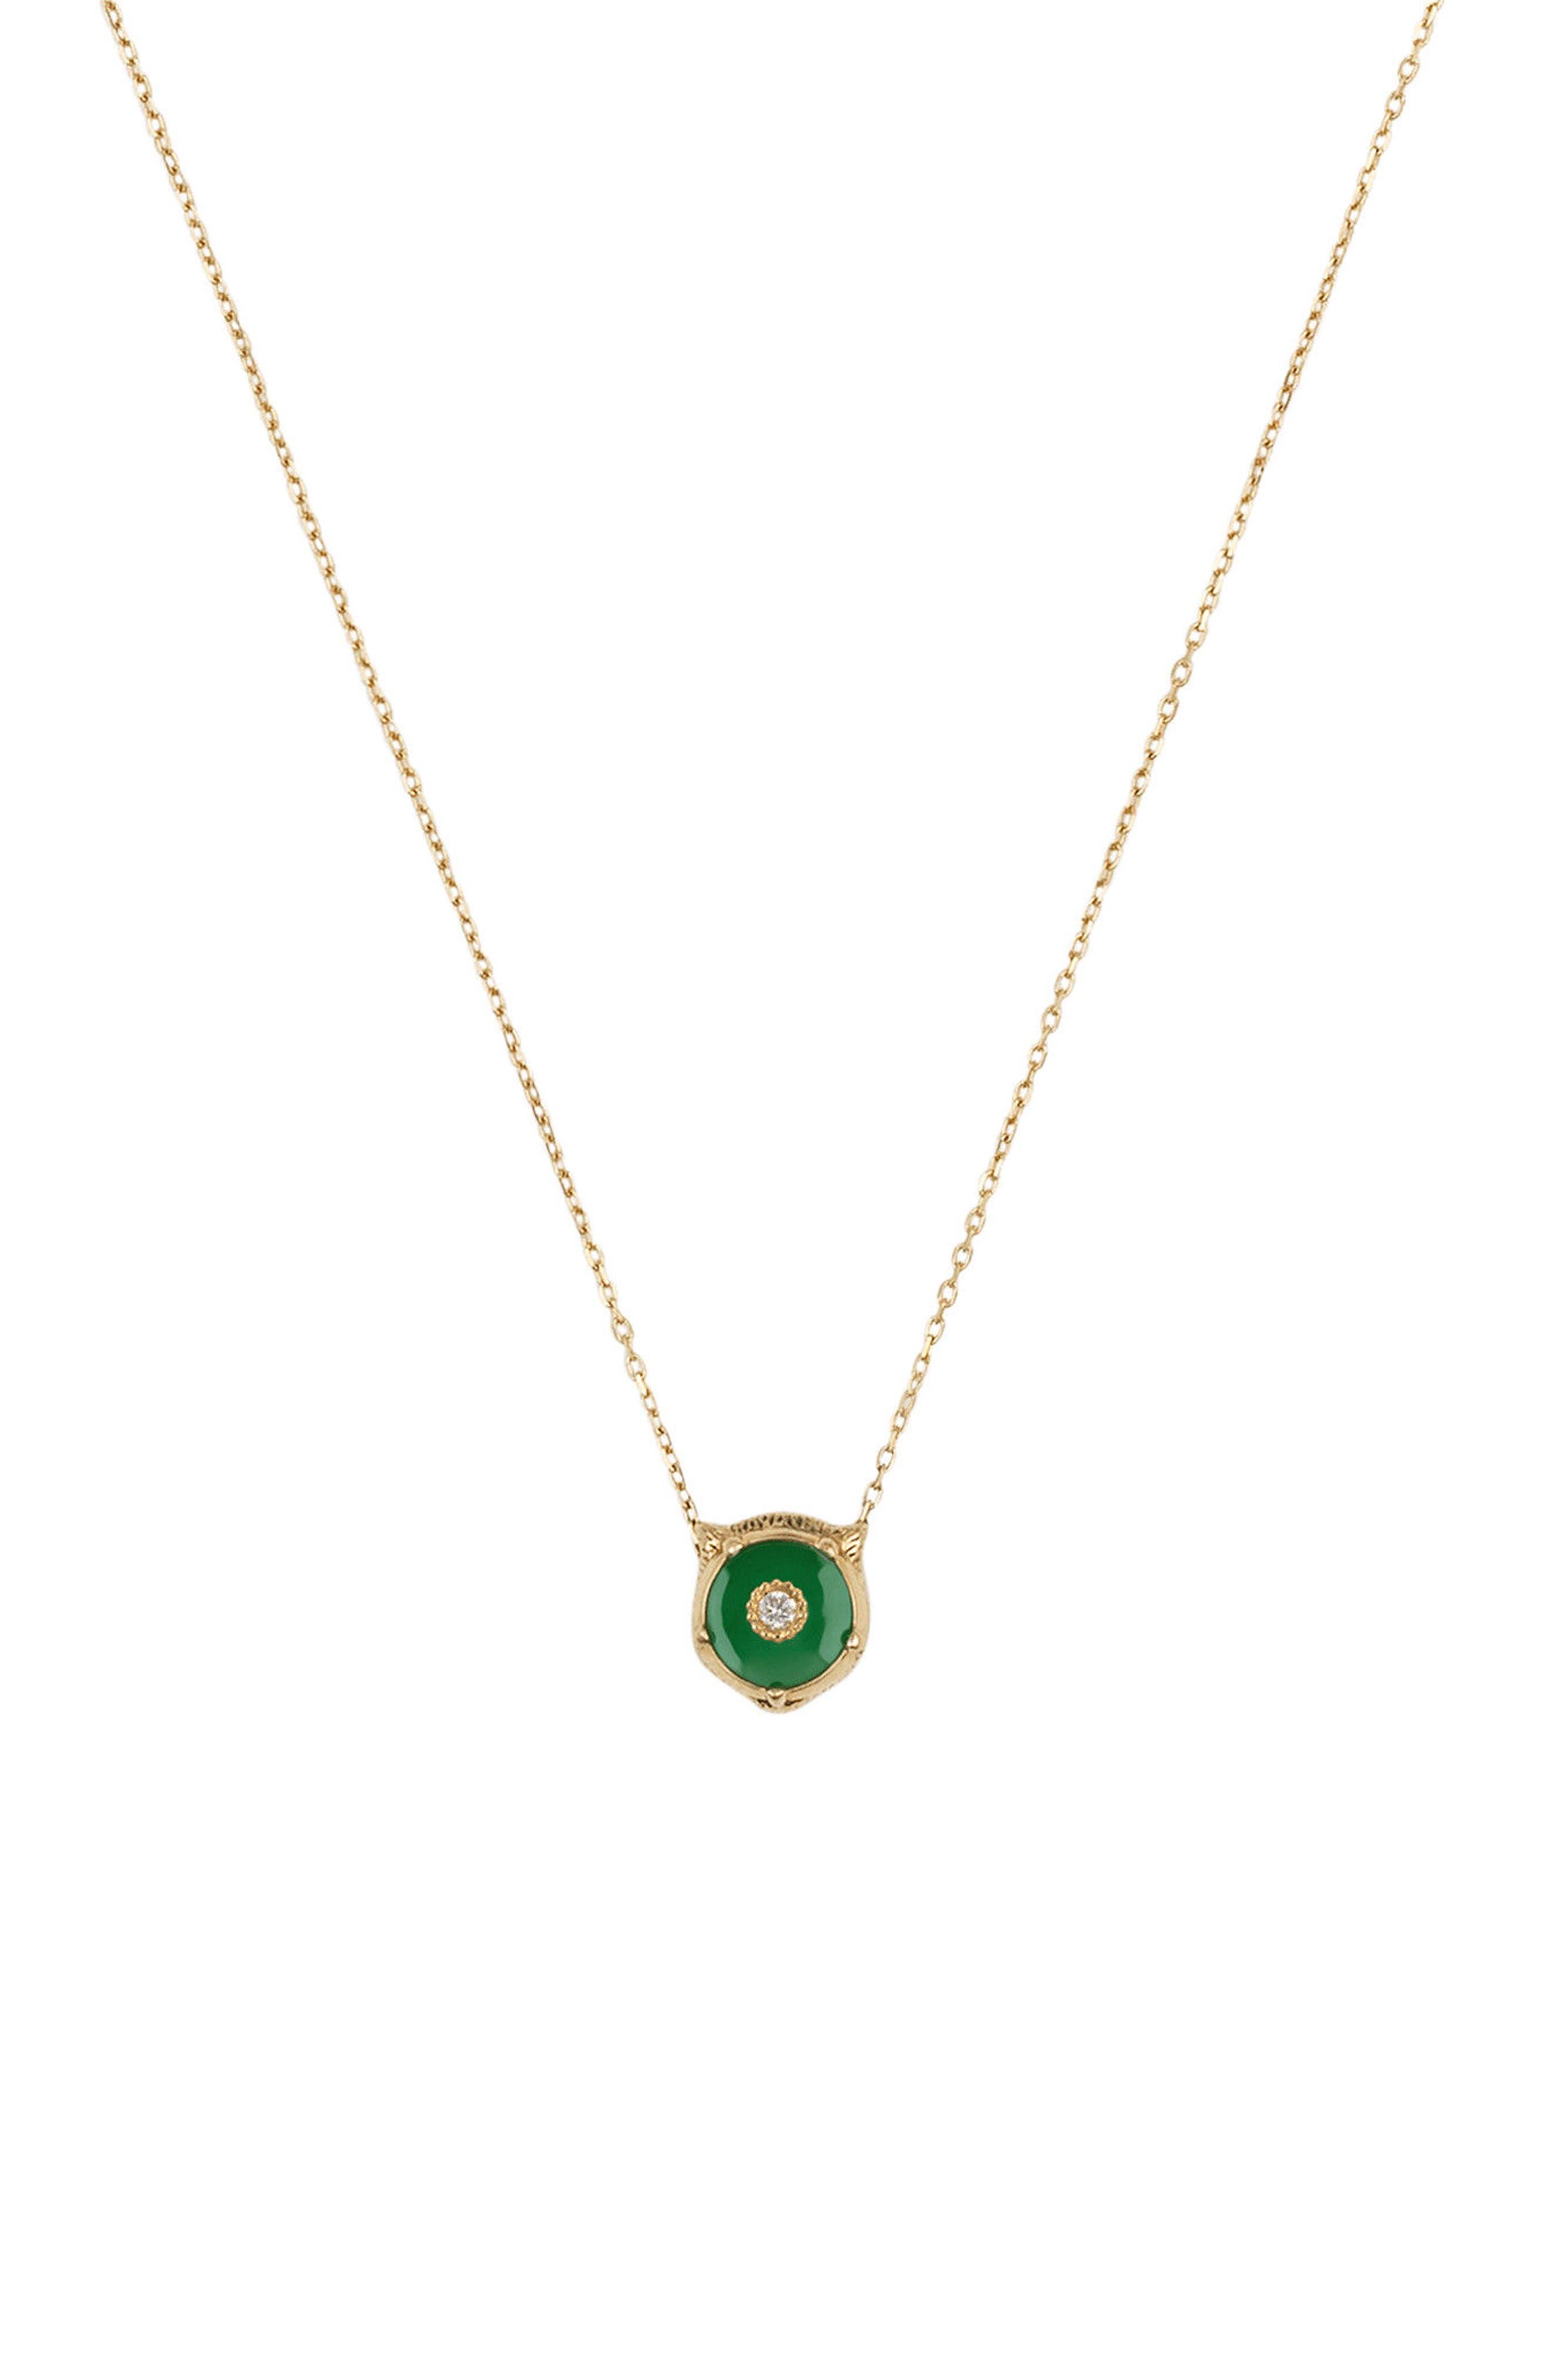 GUCCI,                             Feline Head Pendant Necklace,                             Main thumbnail 1, color,                             YELLOW GOLD/ GREEN JADE